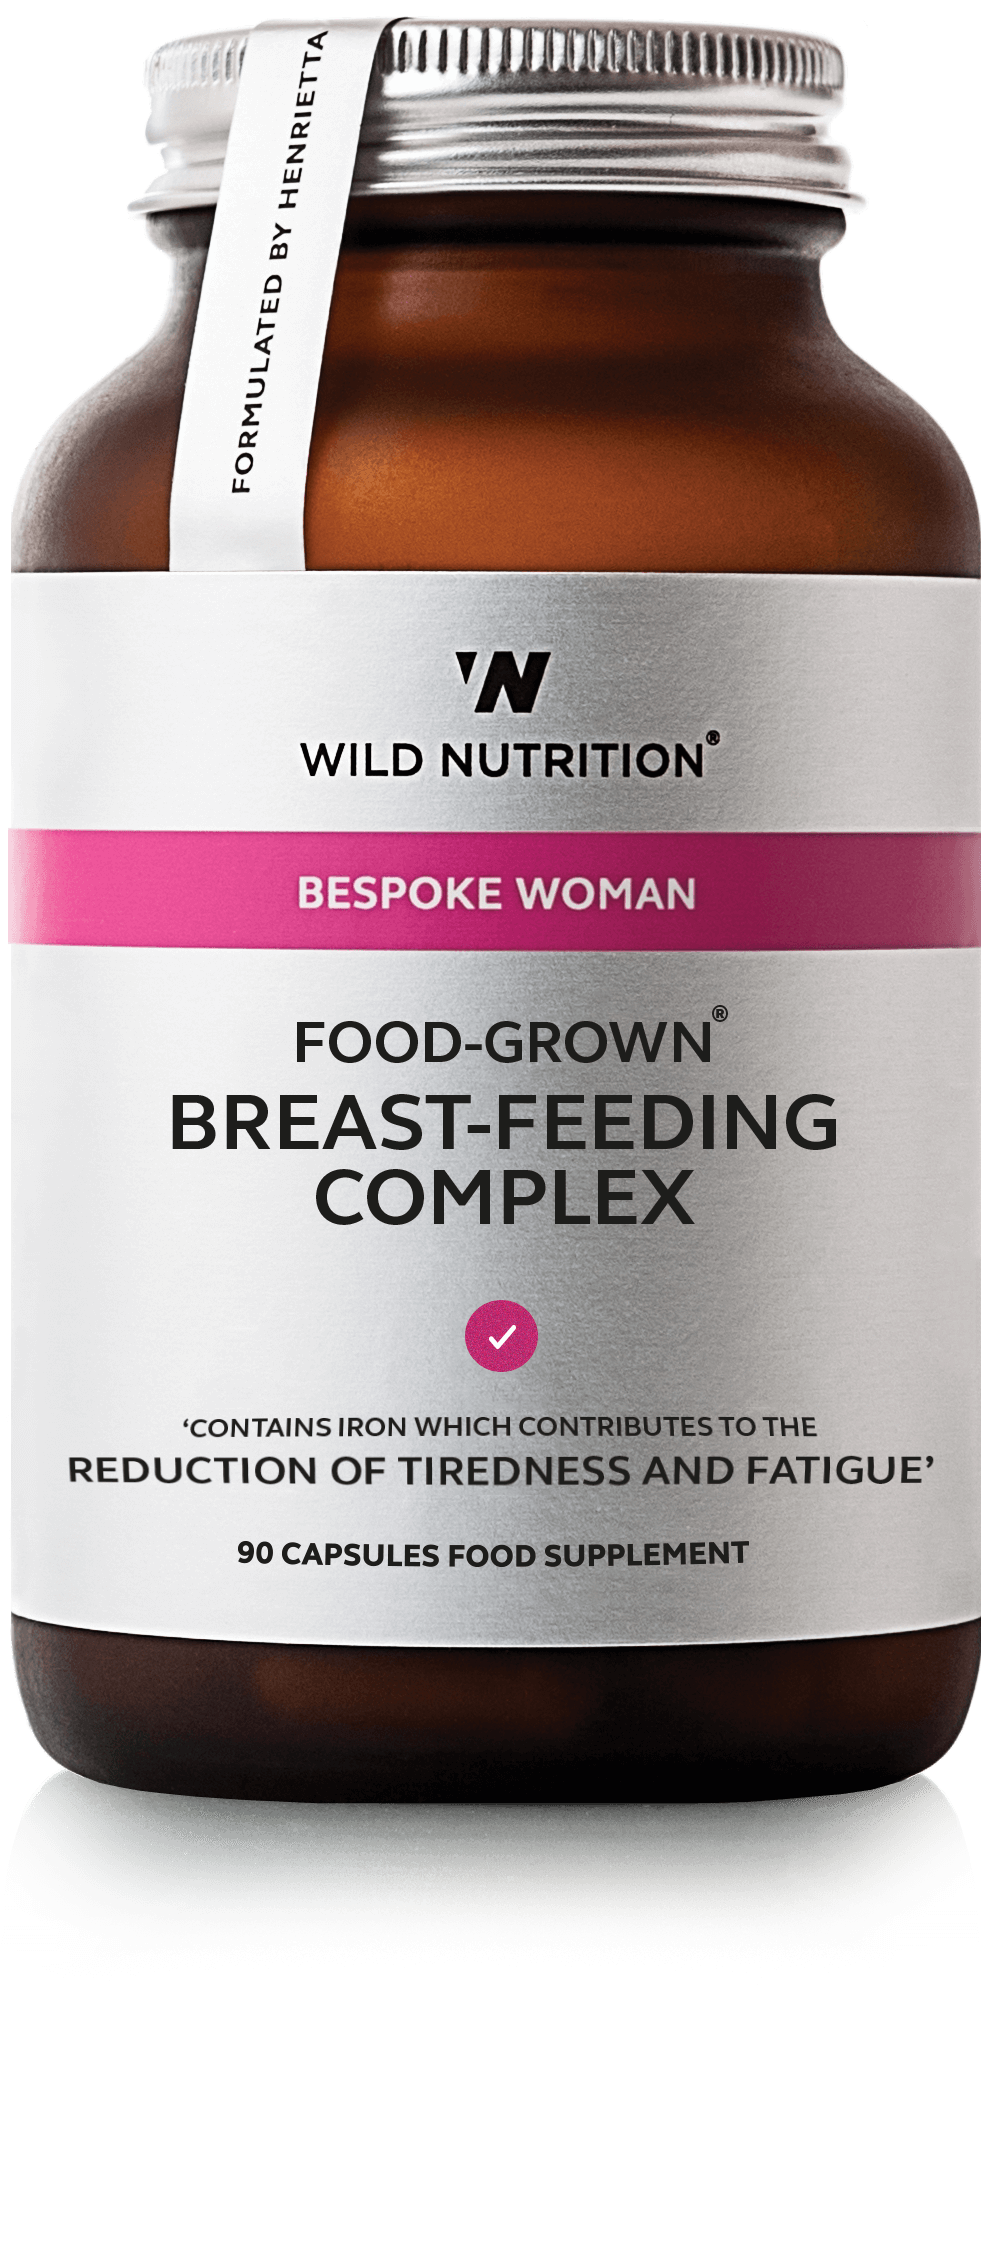 Bespoke Woman Food-Grown Breast-Feeding Complex 90's